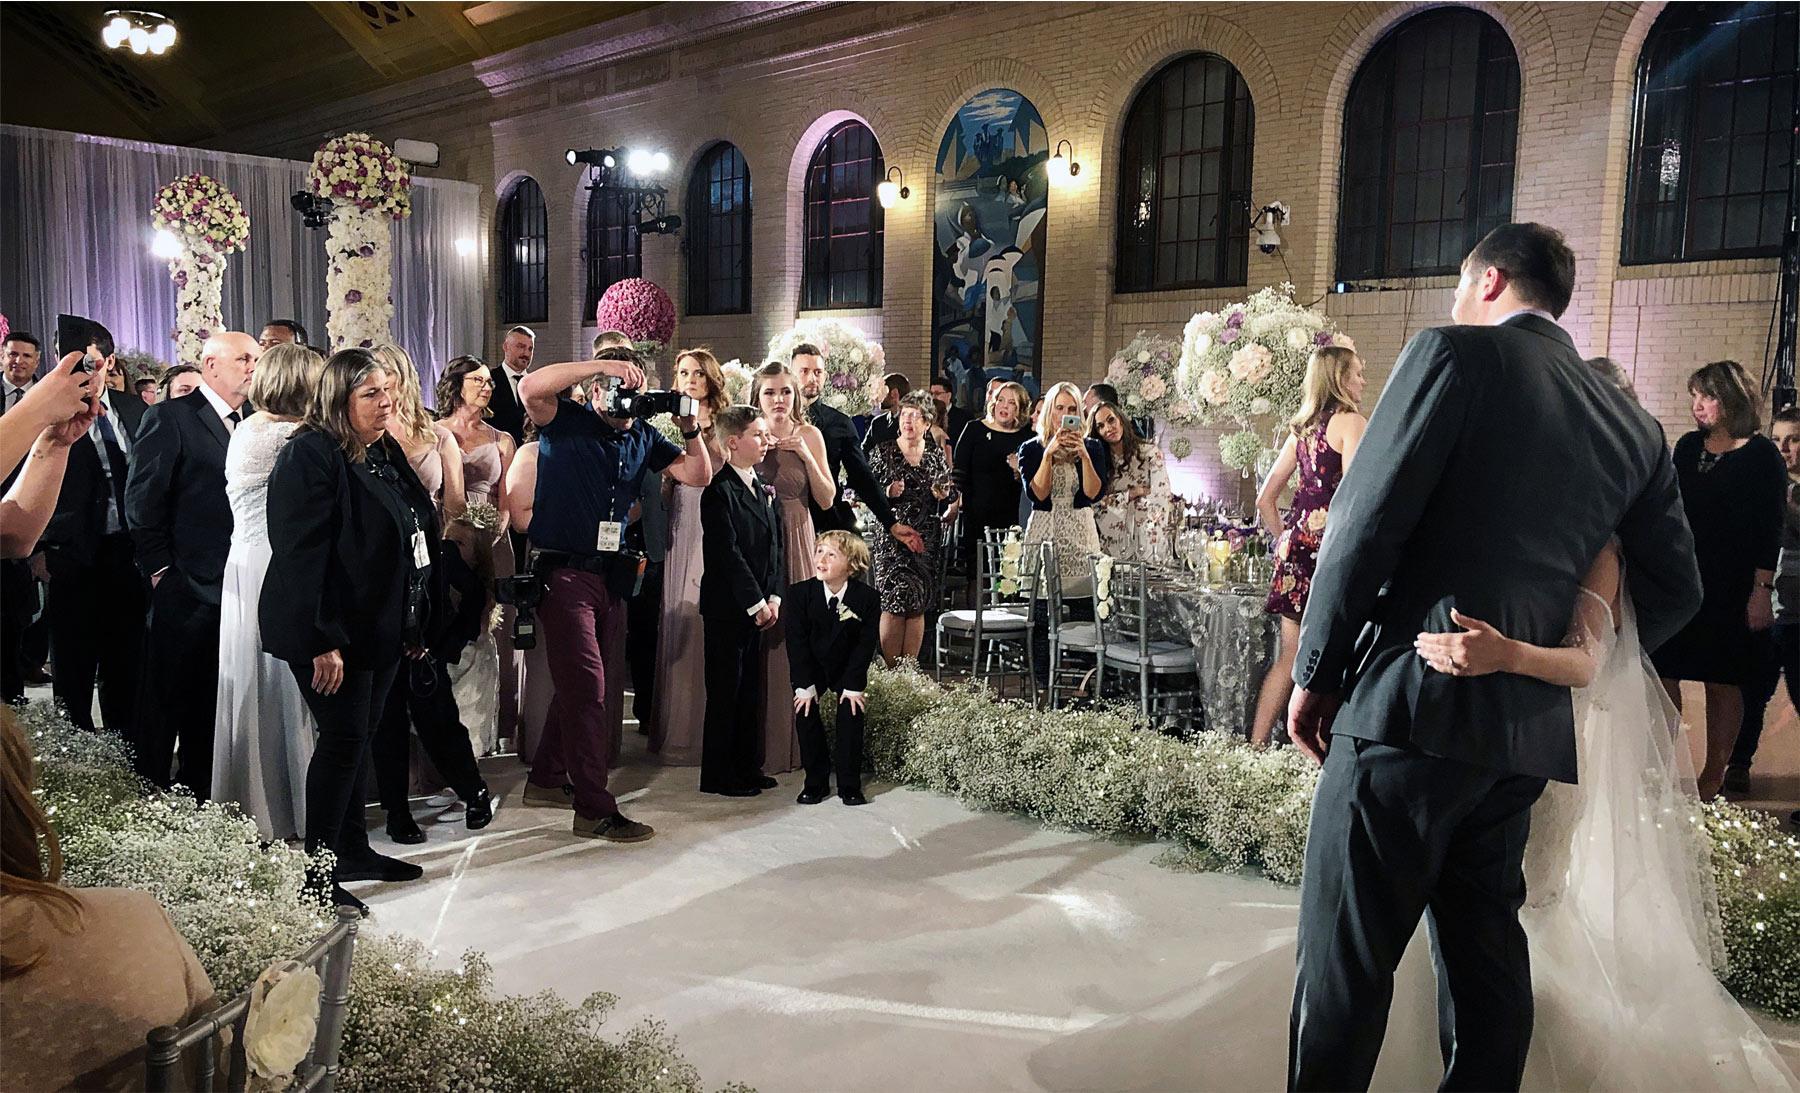 16-Andrew-Vick-Photography-My-Great-Big-Live-Wedding-with-David-Tutera-Behind-the-Scenes-Minnesota-Union-Depot-Saint-Paul.jpg